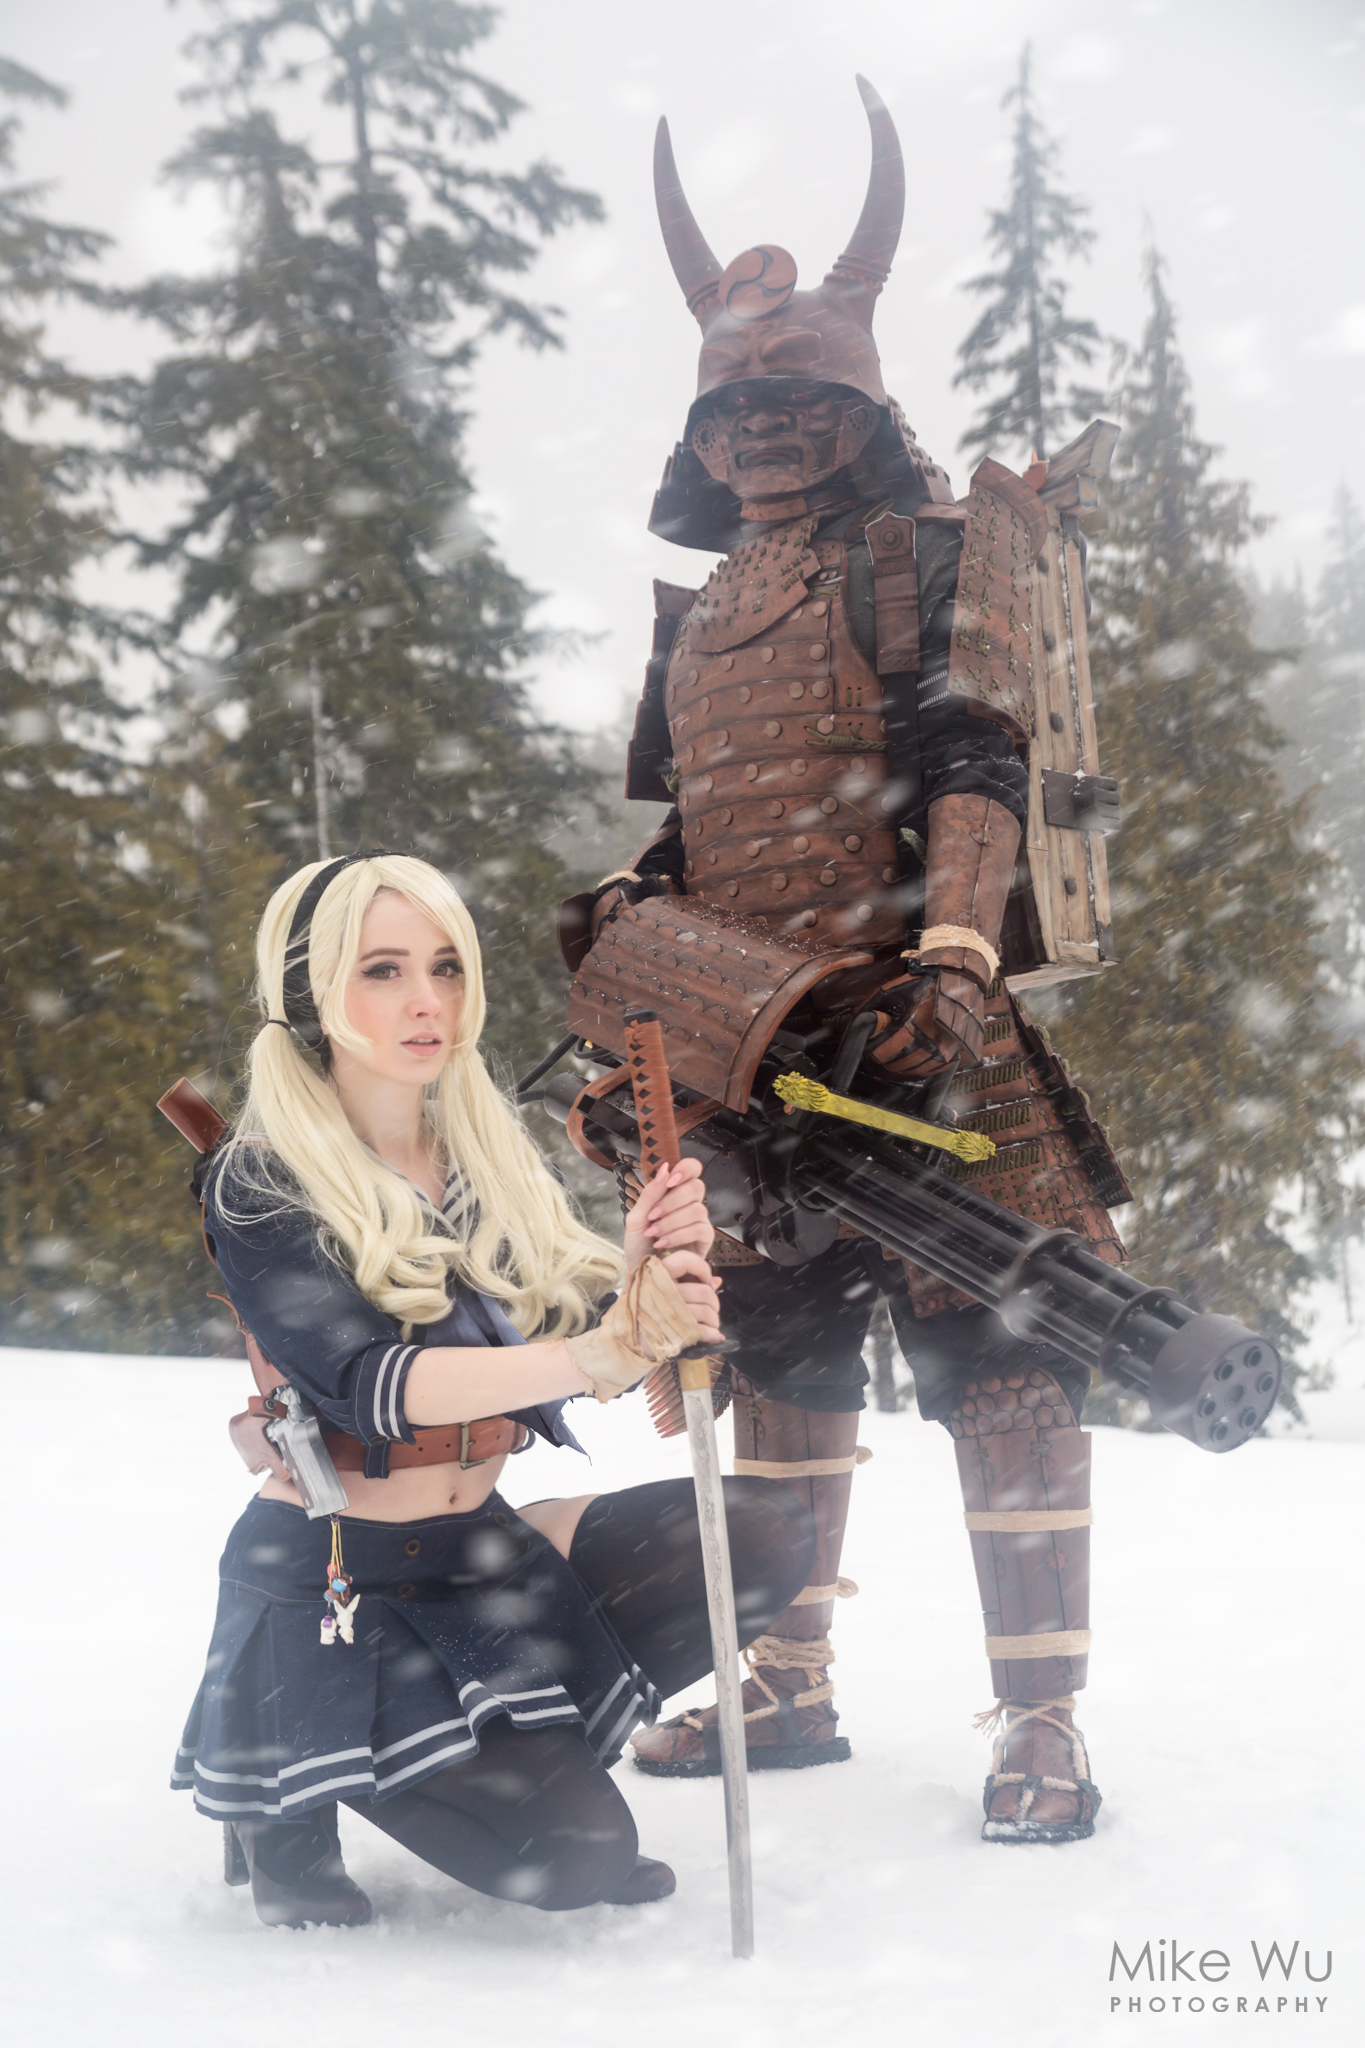 babydoll, boss, samurai, movie, cosplay, cosplayer, sword, gun, machine gun, vancouver, mountain, snow